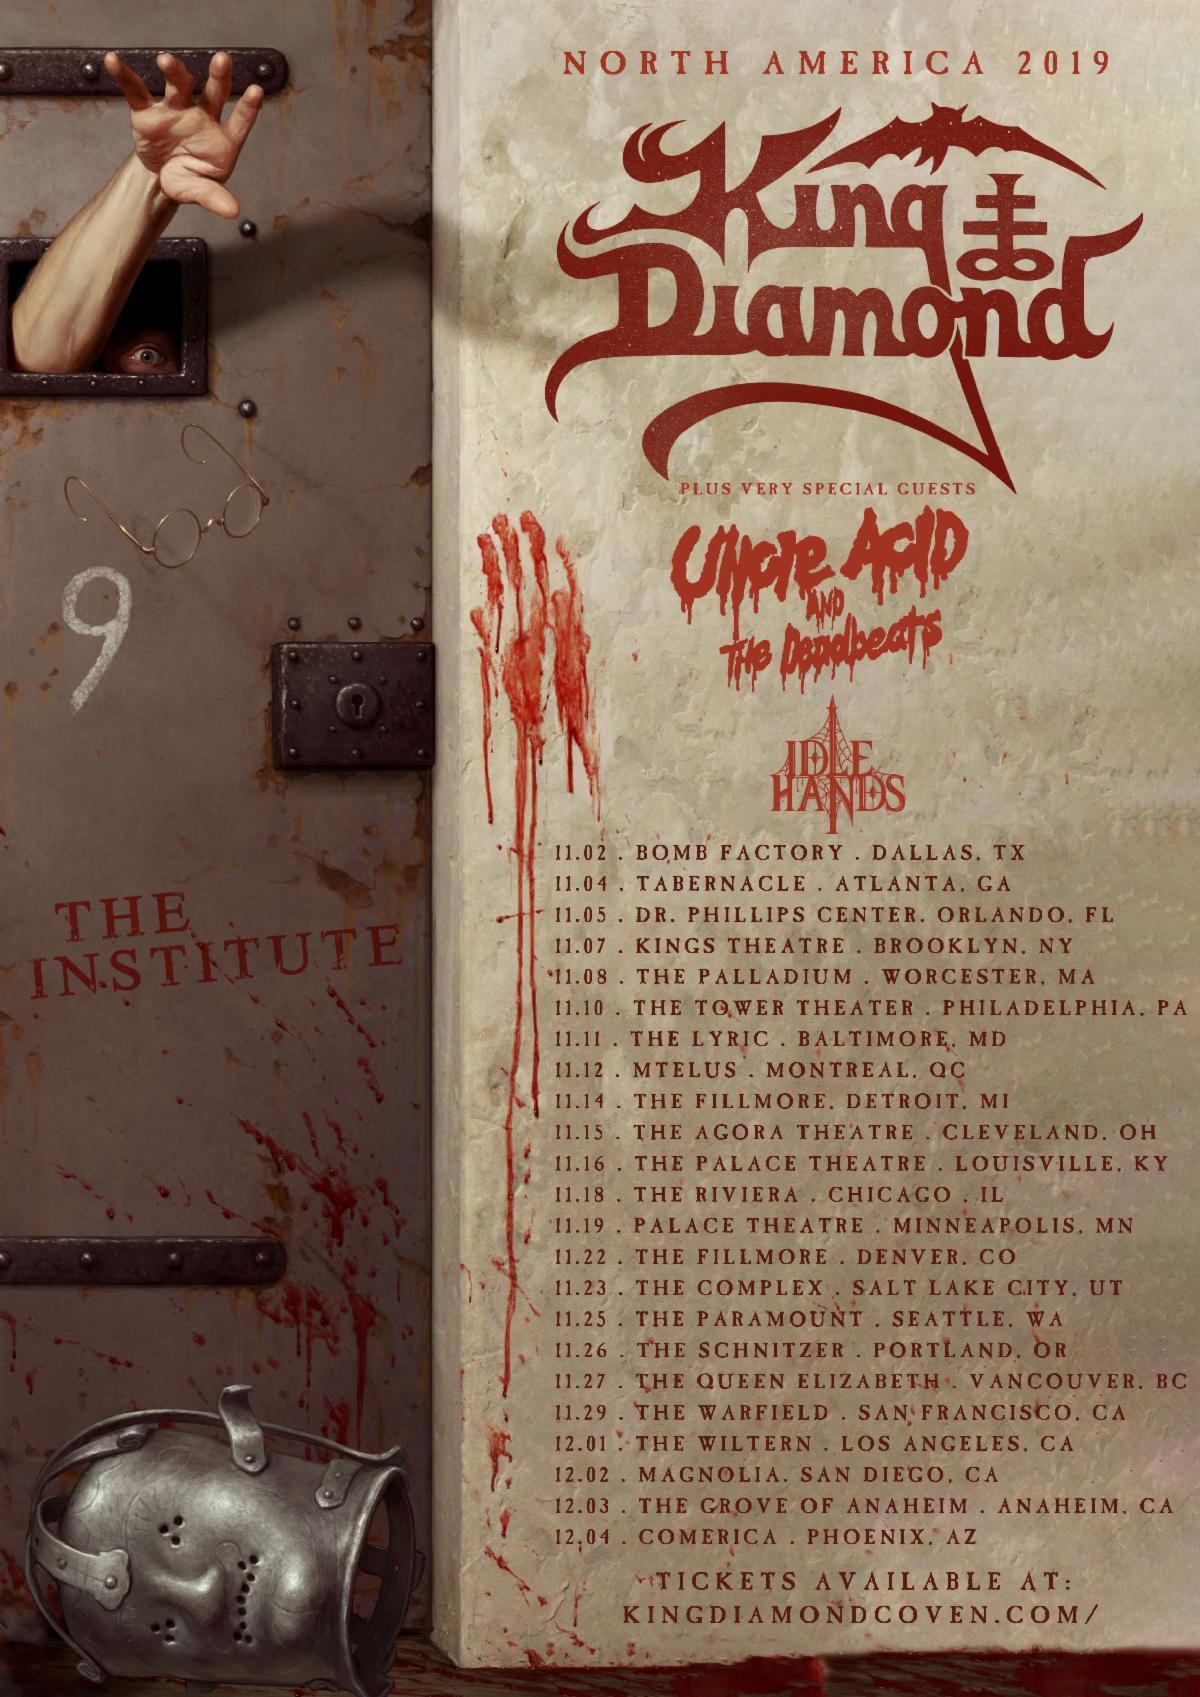 Diamond Tours 2020 Schedule News: KING DIAMOND Announces N. America Tour & Album Details